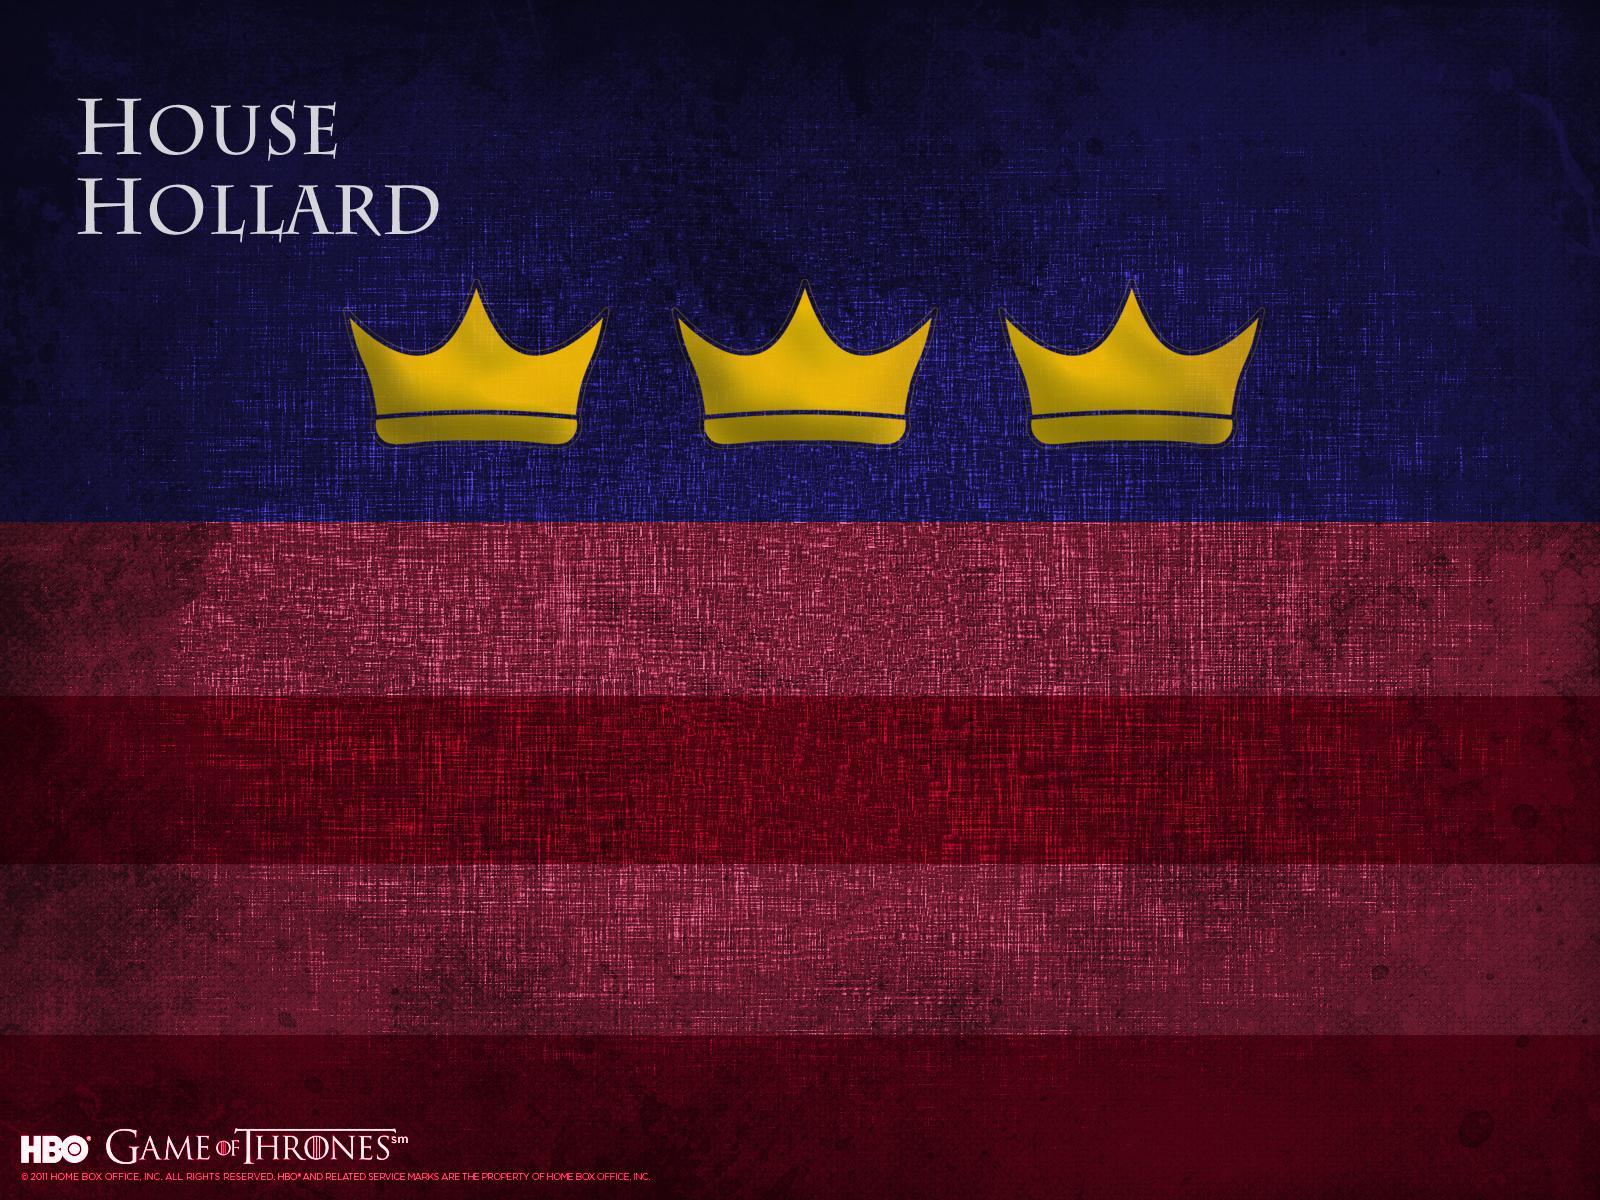 House Hollard